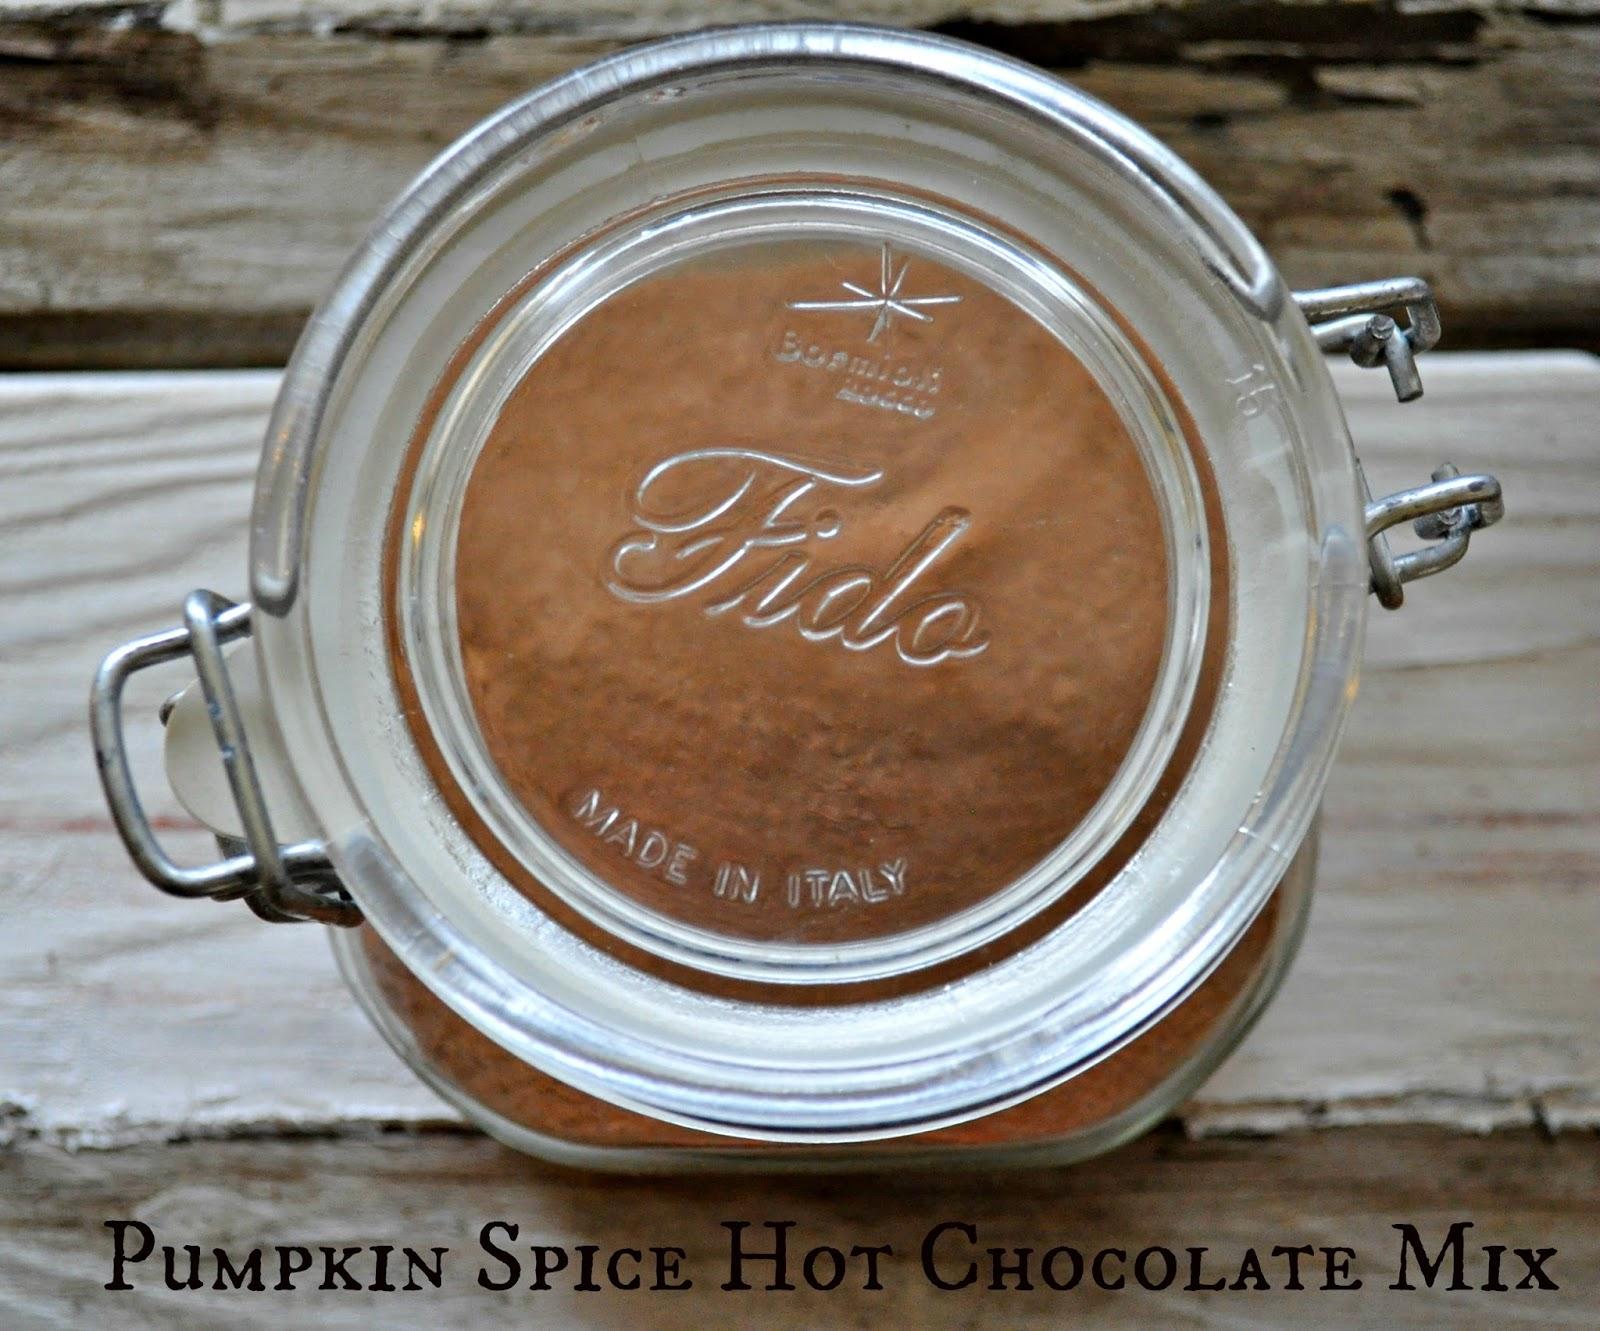 Pumpkin Spice Hot Chocolate Mix for #Choctoberfest   Little House ...